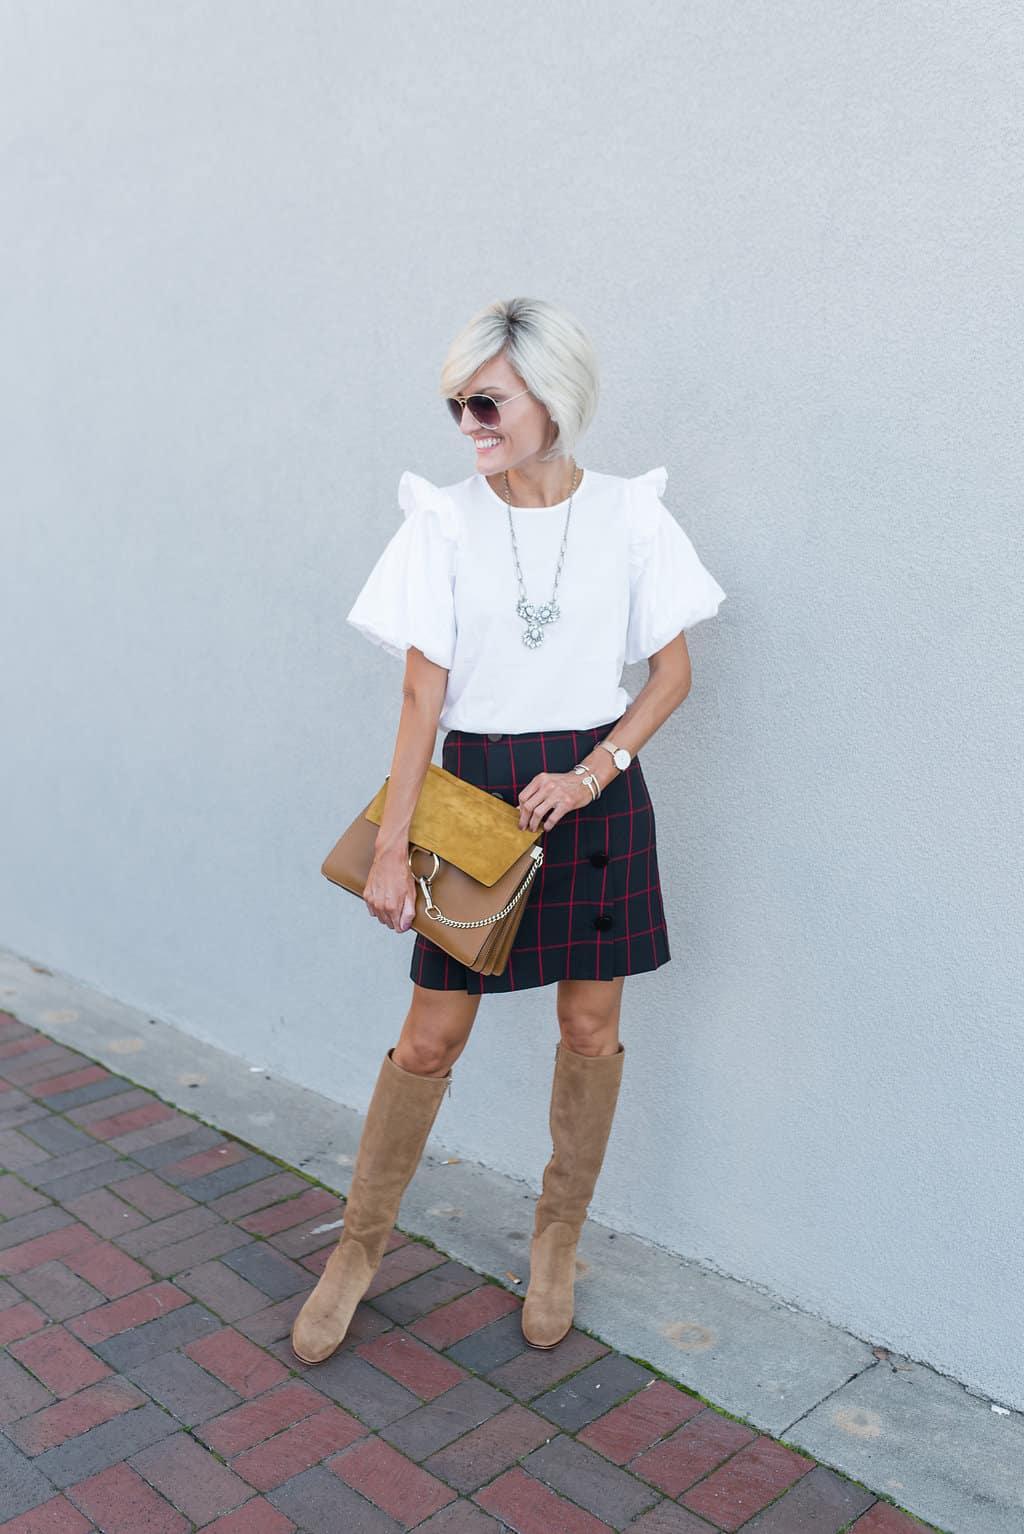 40% off Plaid Skirt + Sale Alert